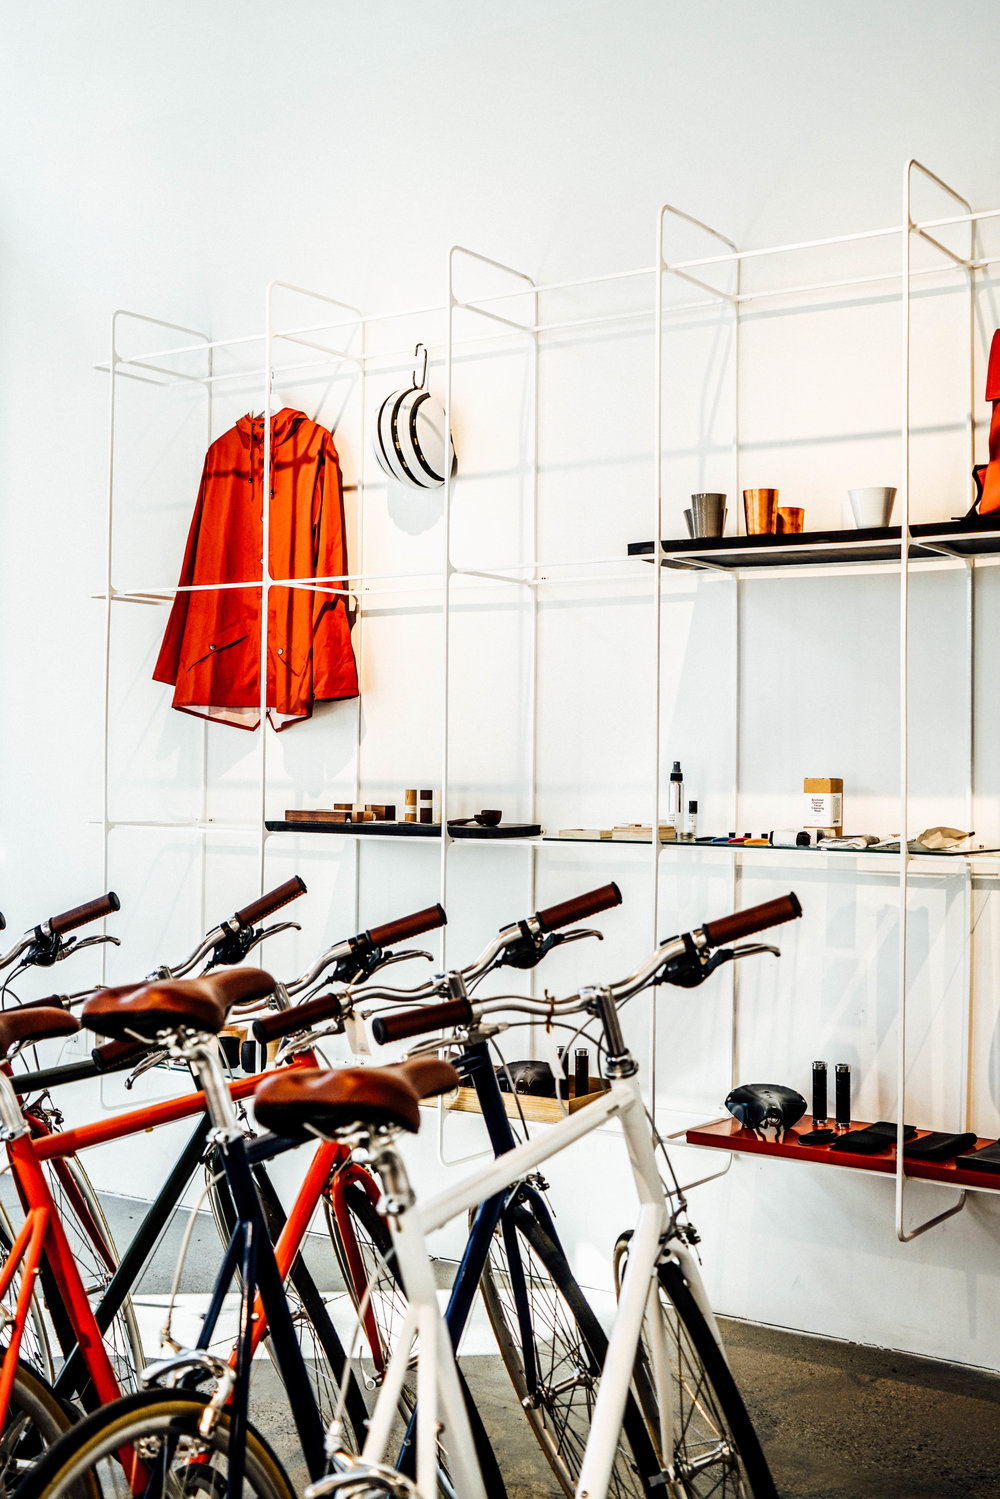 LA-Downtowner-Tokyo-Bikes-dtla-3.jpg